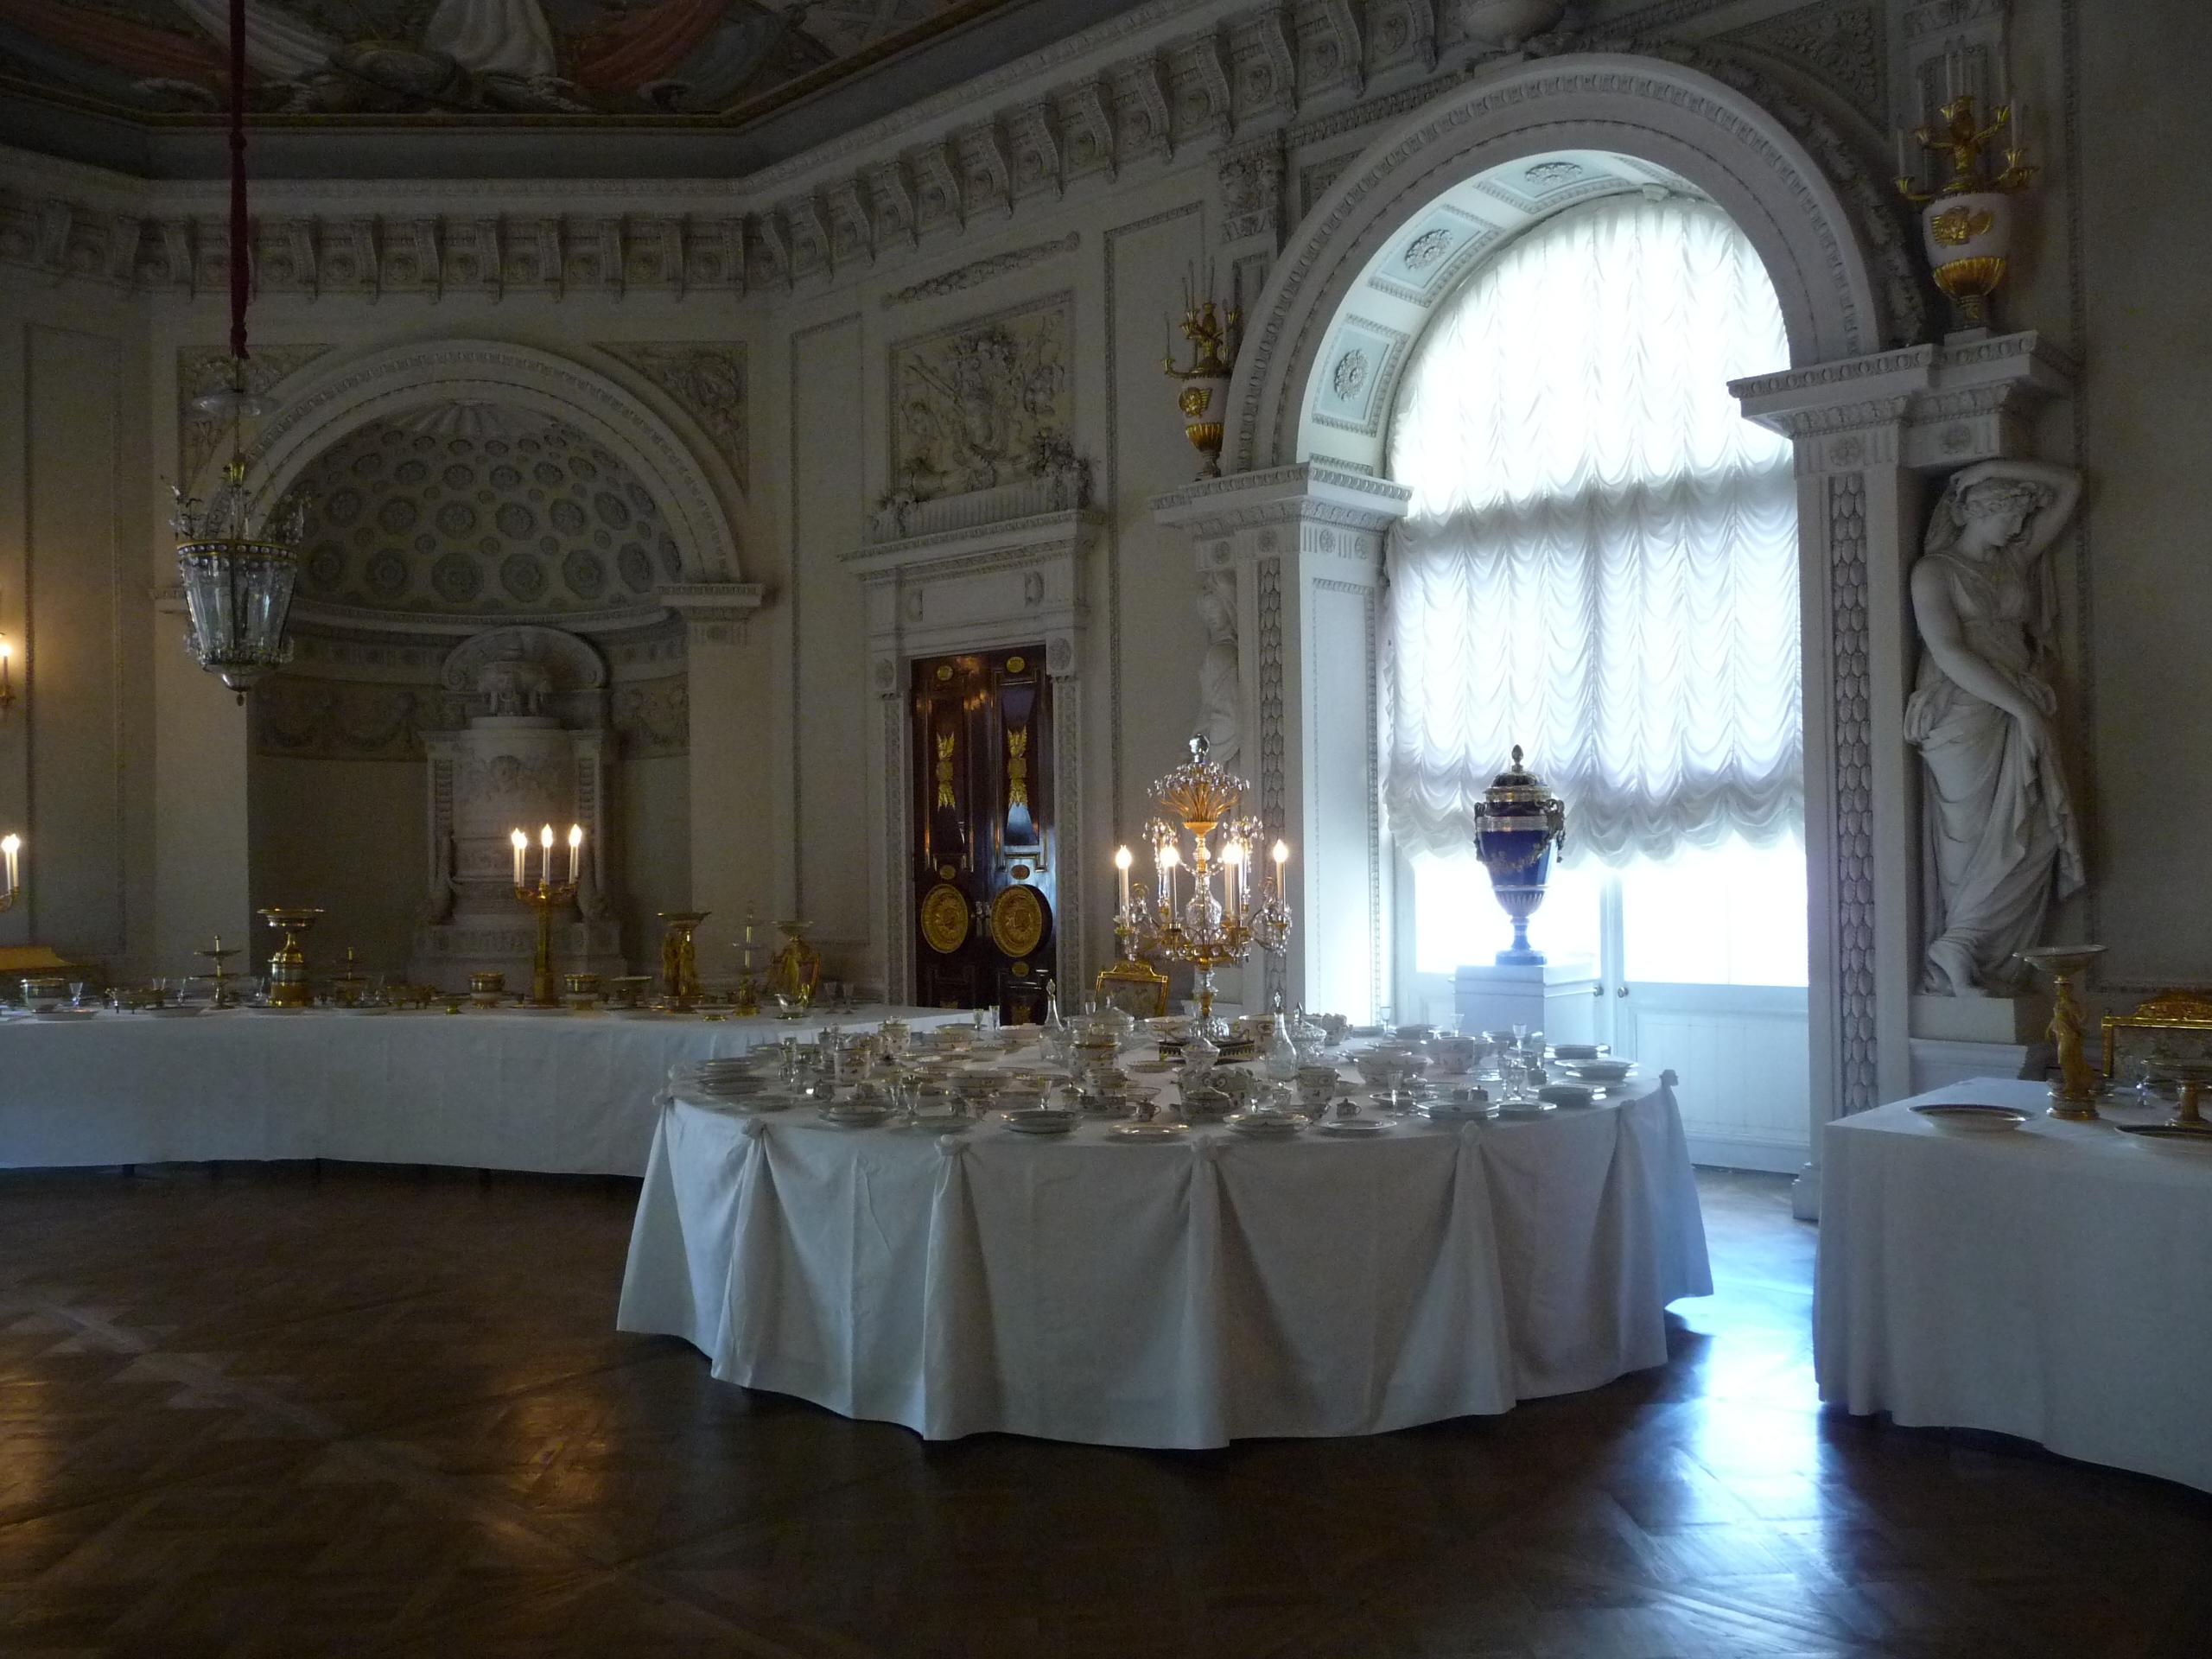 Pavlovsk Palace Interior #328299 2560 1920 Sala Da Pranzo Buckingham Palace